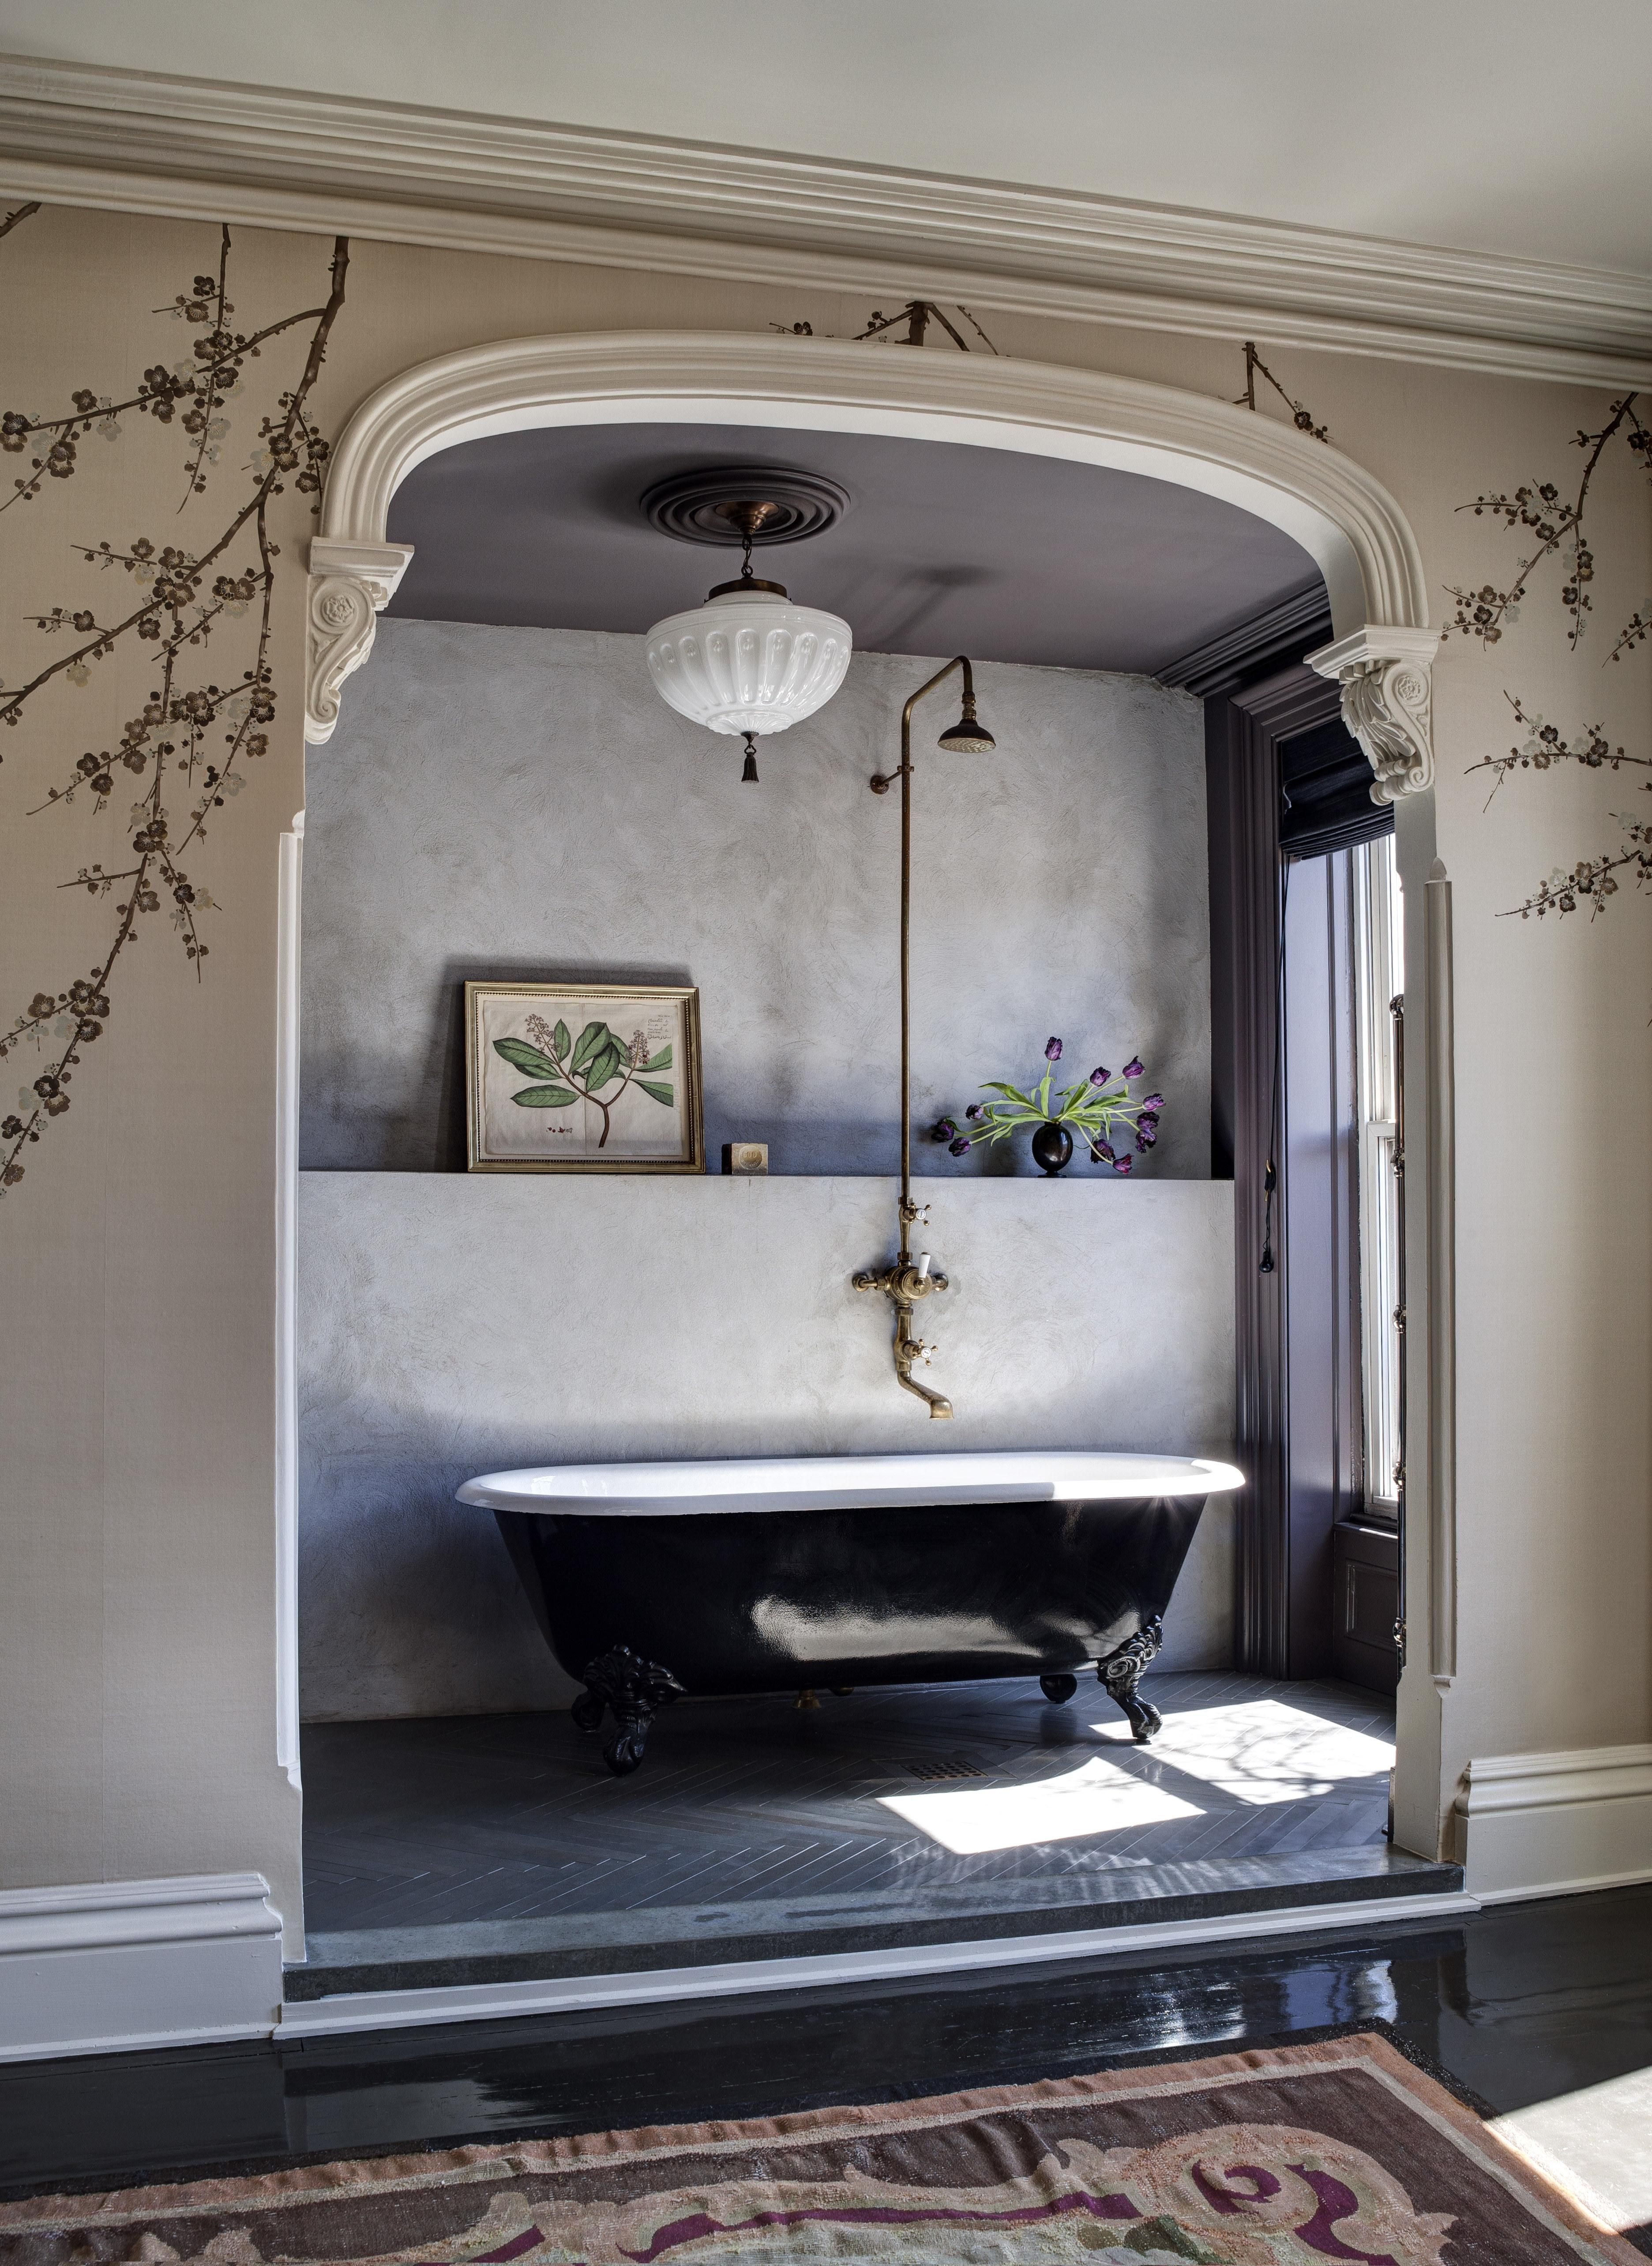 Viceroy New York Roman And Williams Dark Blue Bathrooms Home Goods Decor Blue Bathroom Tile